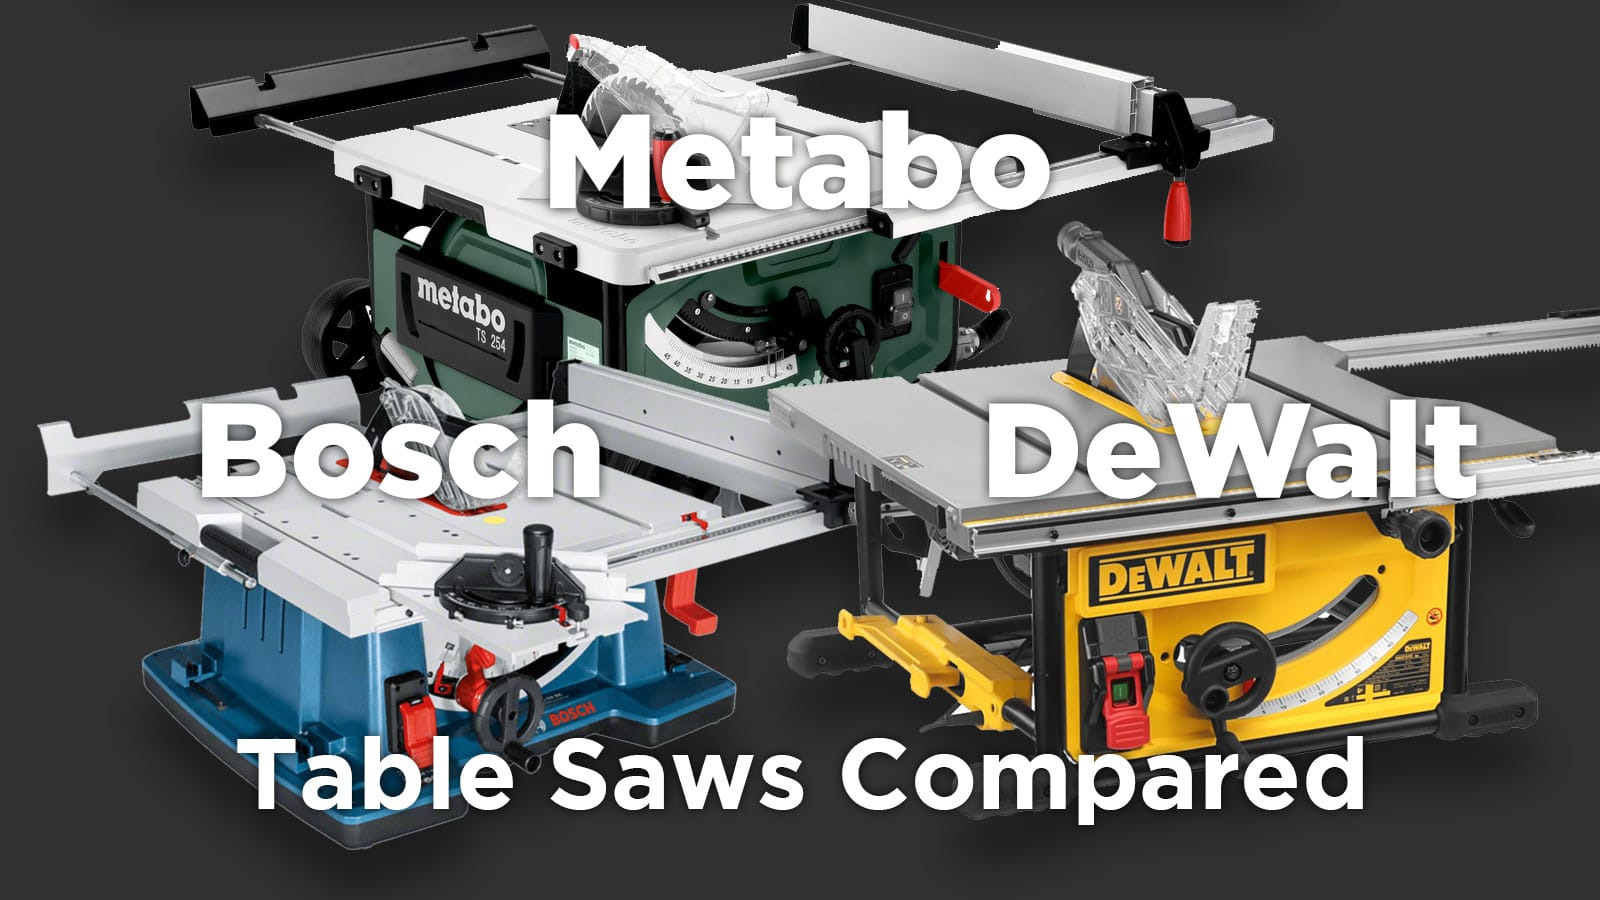 Bosch GTS 10 XC vs DeWalt DWE7492 vs Metabo TS 254 – Flagship Table Saws Compared